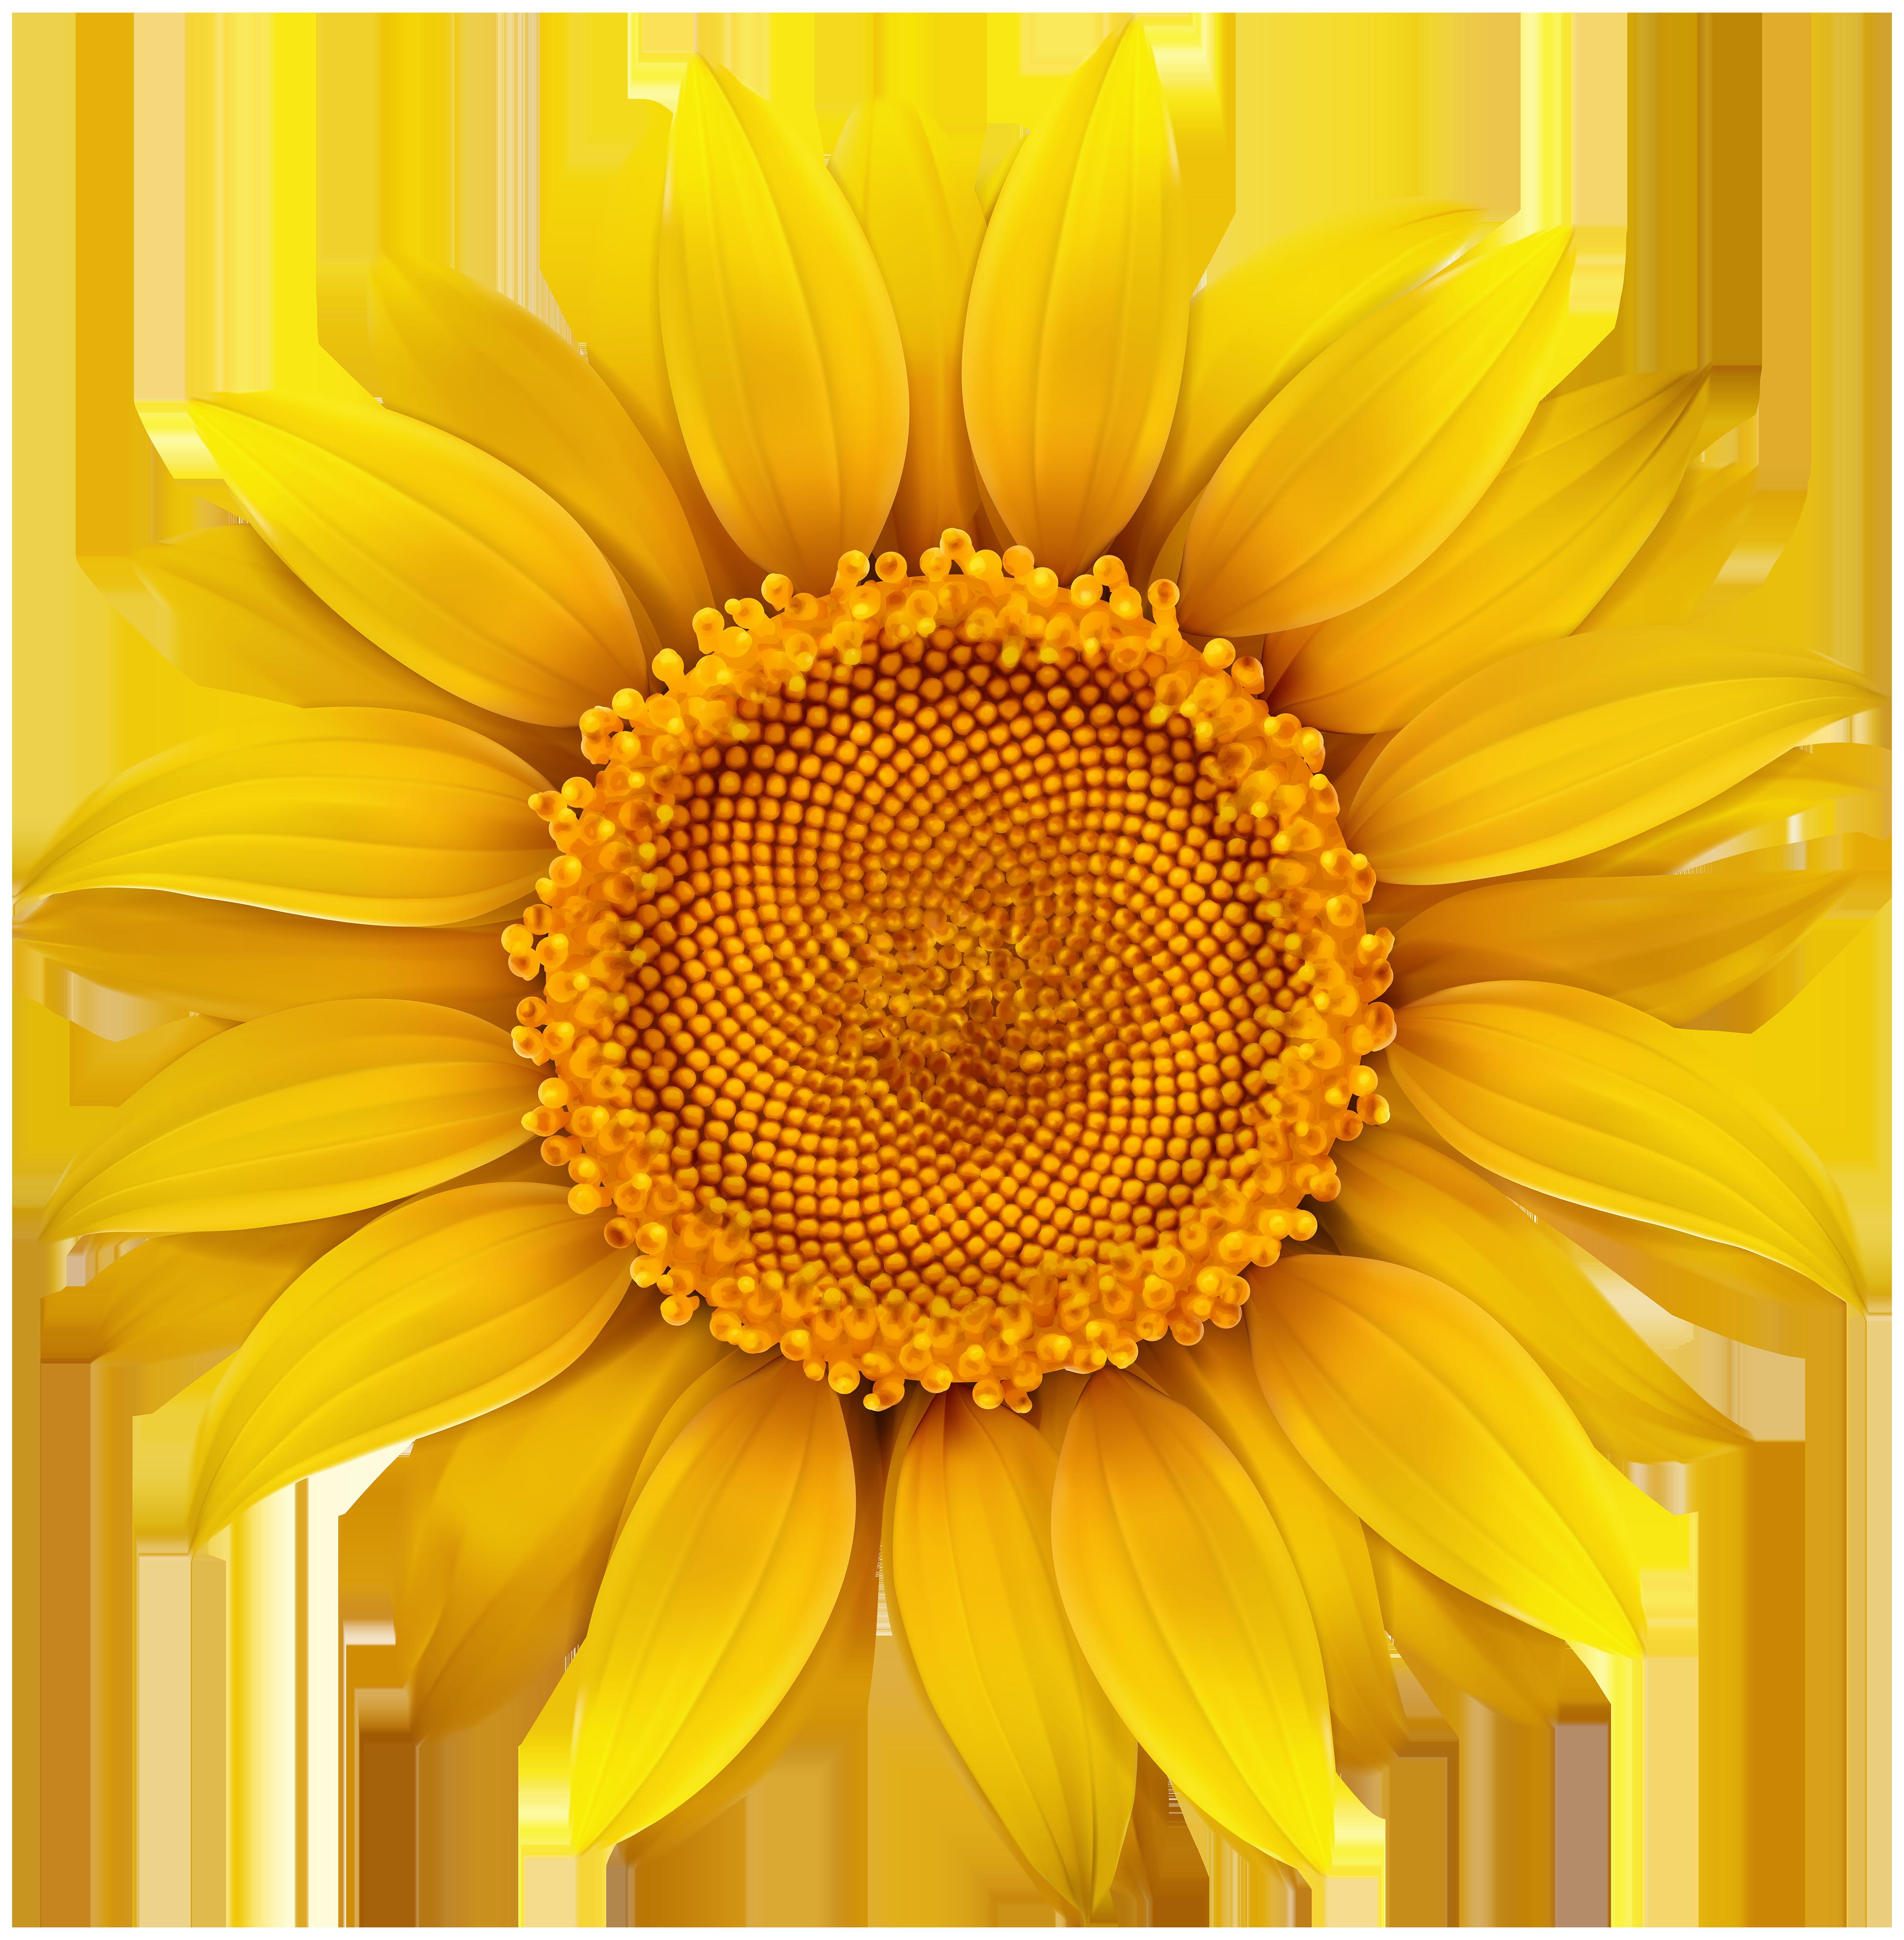 Sun flower png. Sunflower image gallery yopriceville